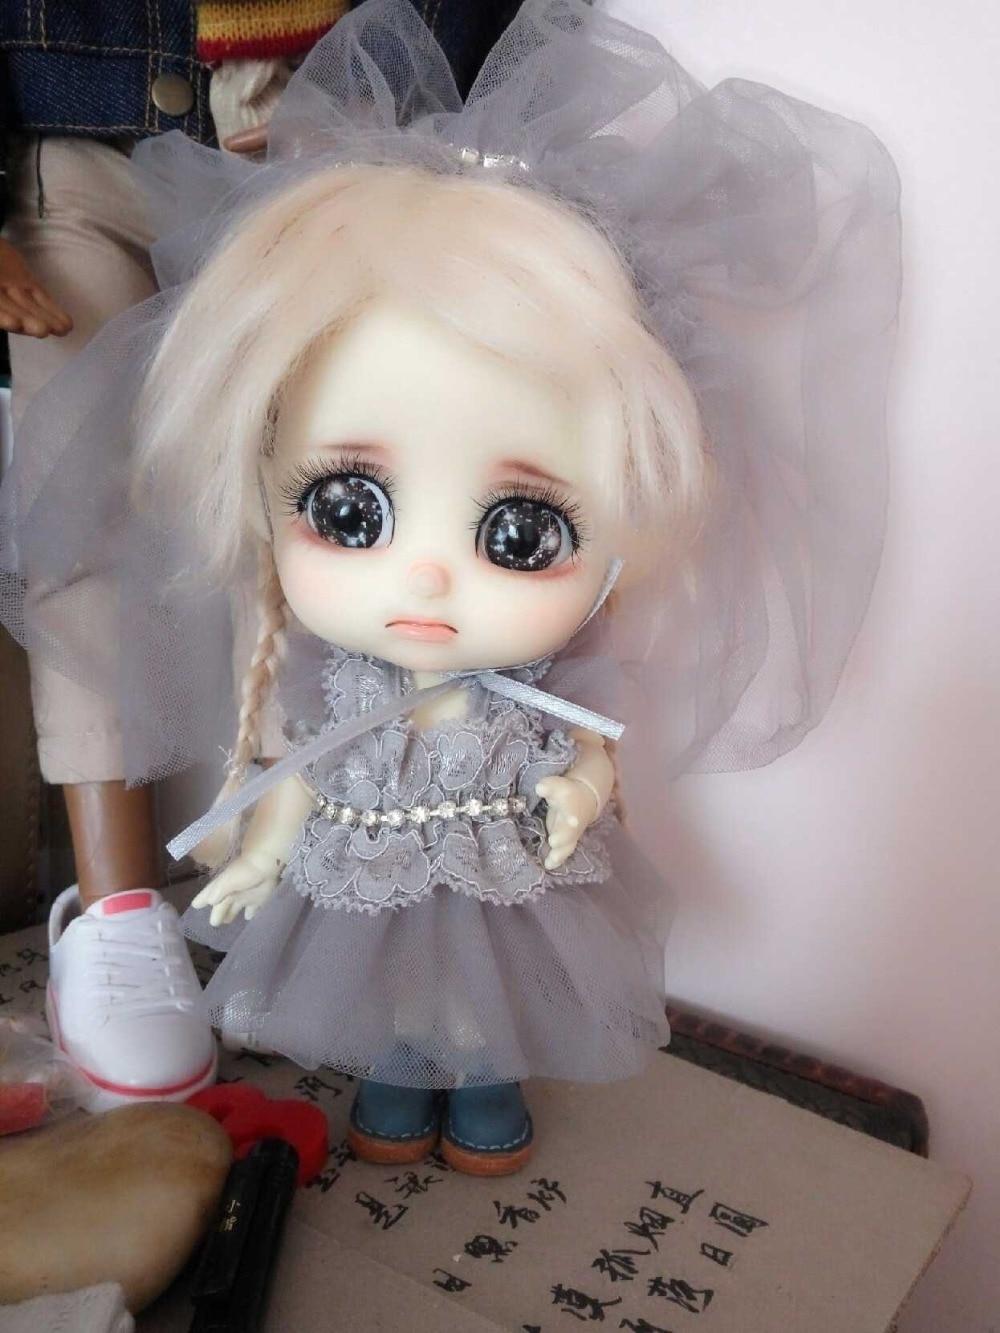 BJD 1/8 pop slaap baby fashion doll-in Poppen van Speelgoed & Hobbies op  Groep 2